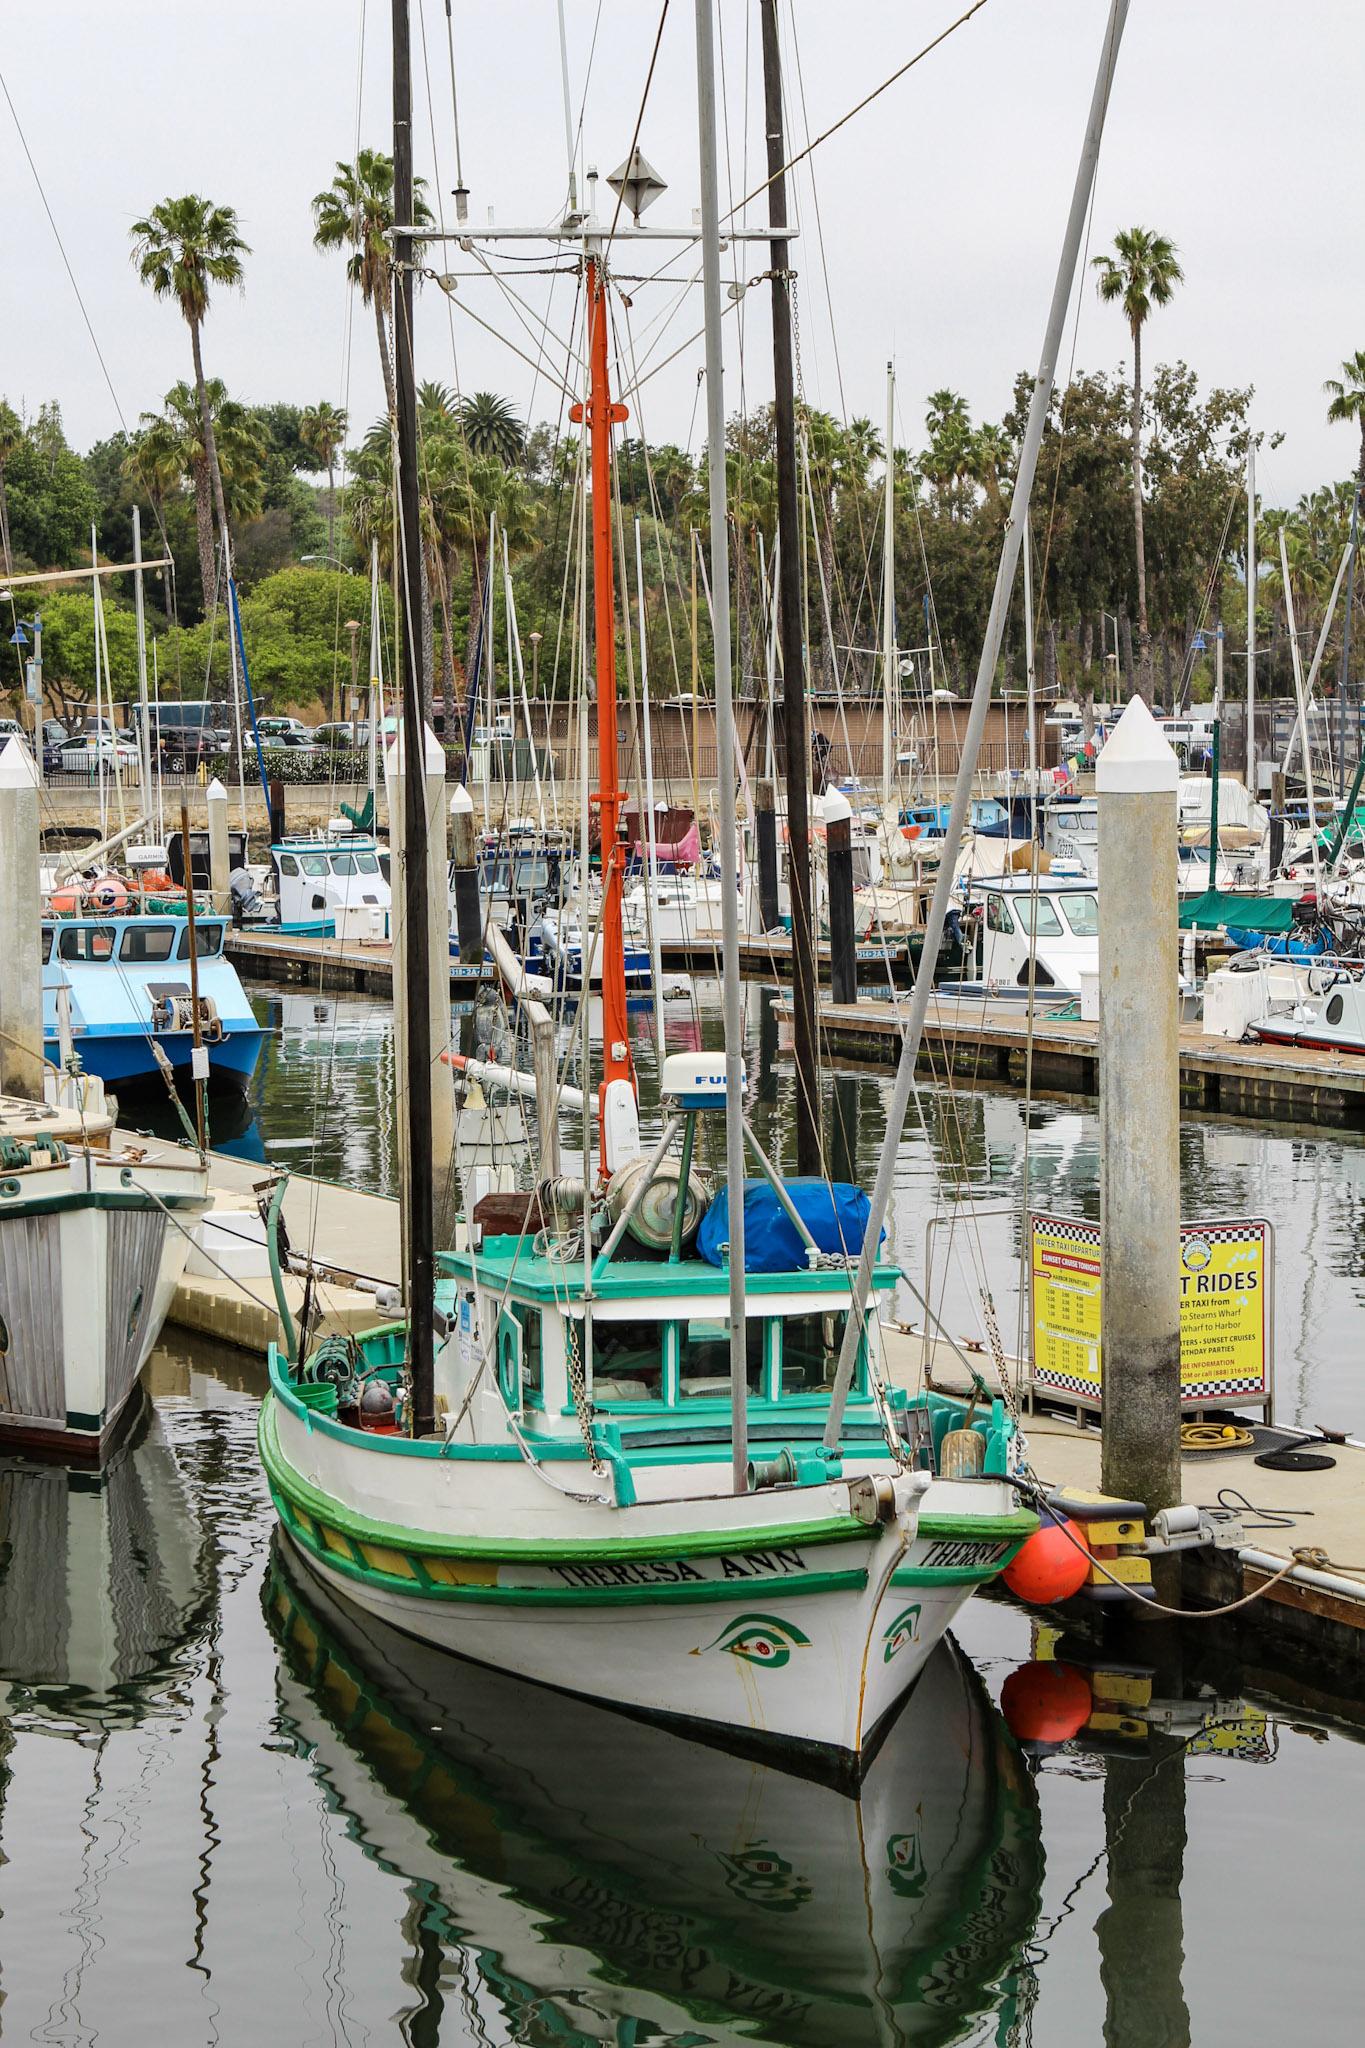 A Long Weekend in Santa Barbara   Freckled Italian